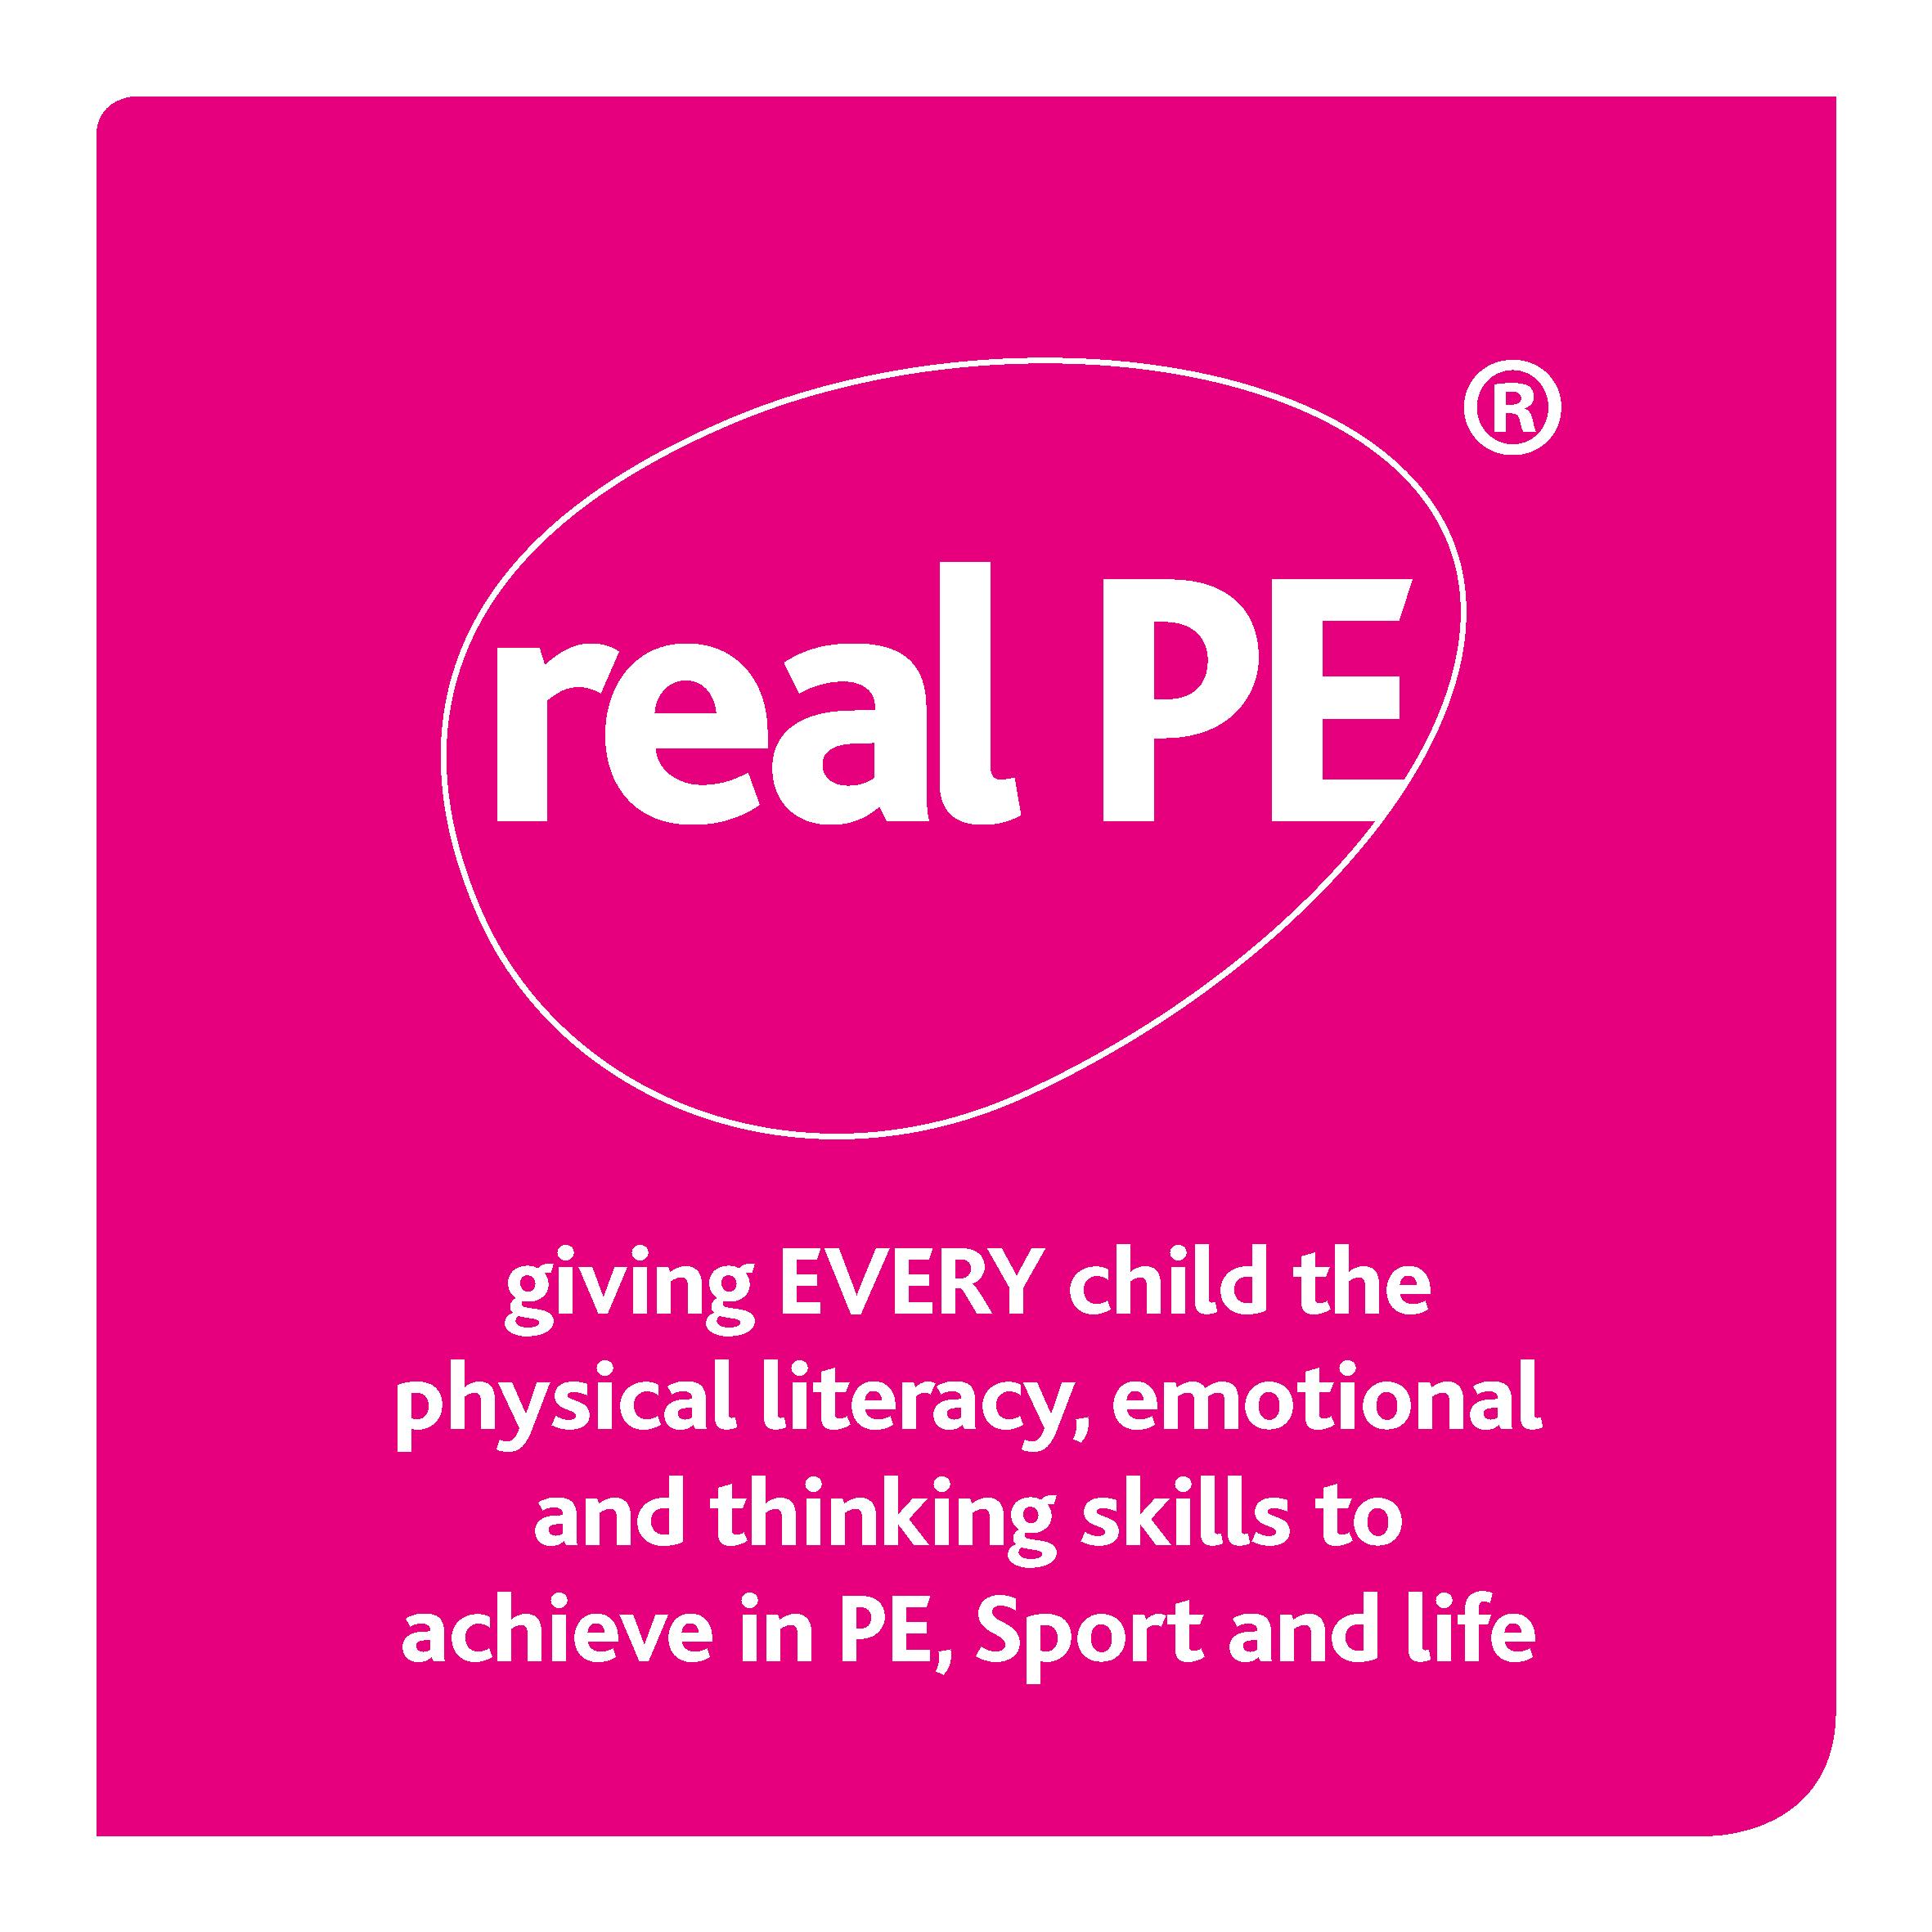 real PE.jpg